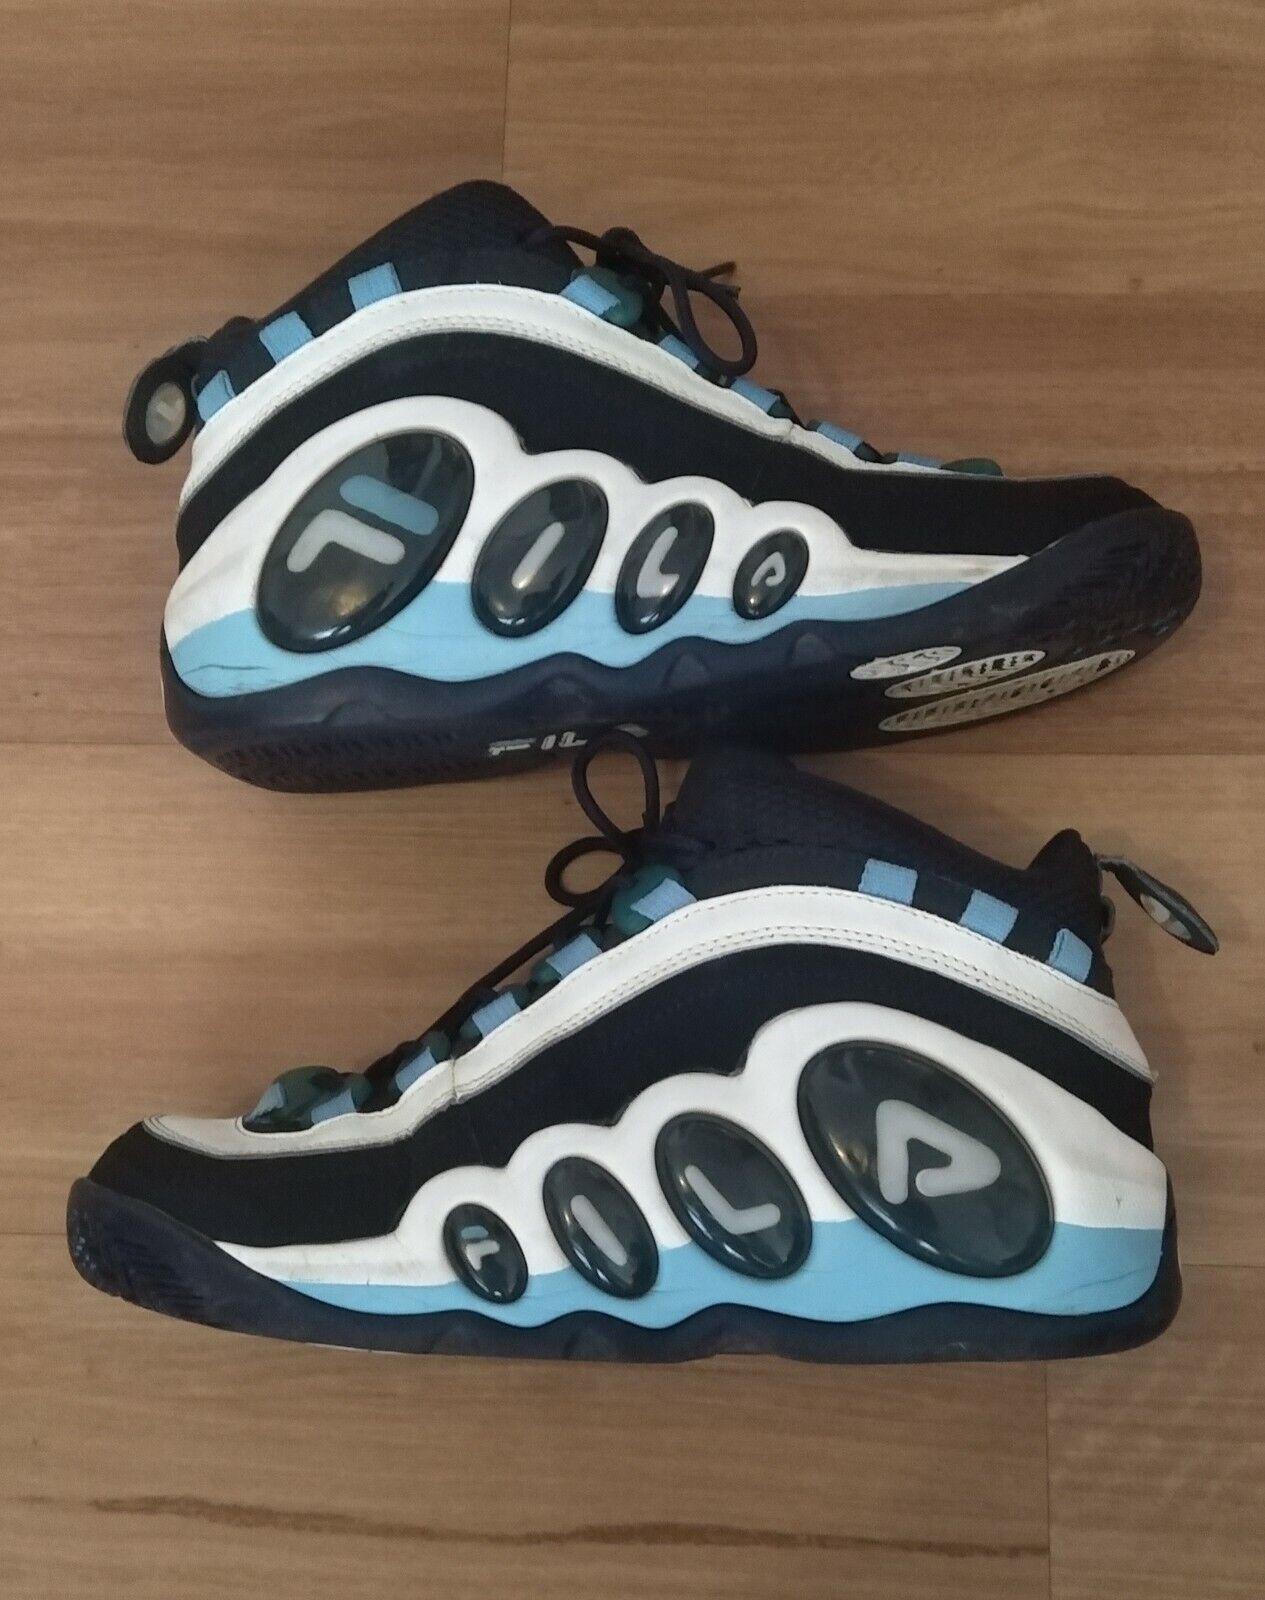 Fila sneakers for men Bubbles Navy white